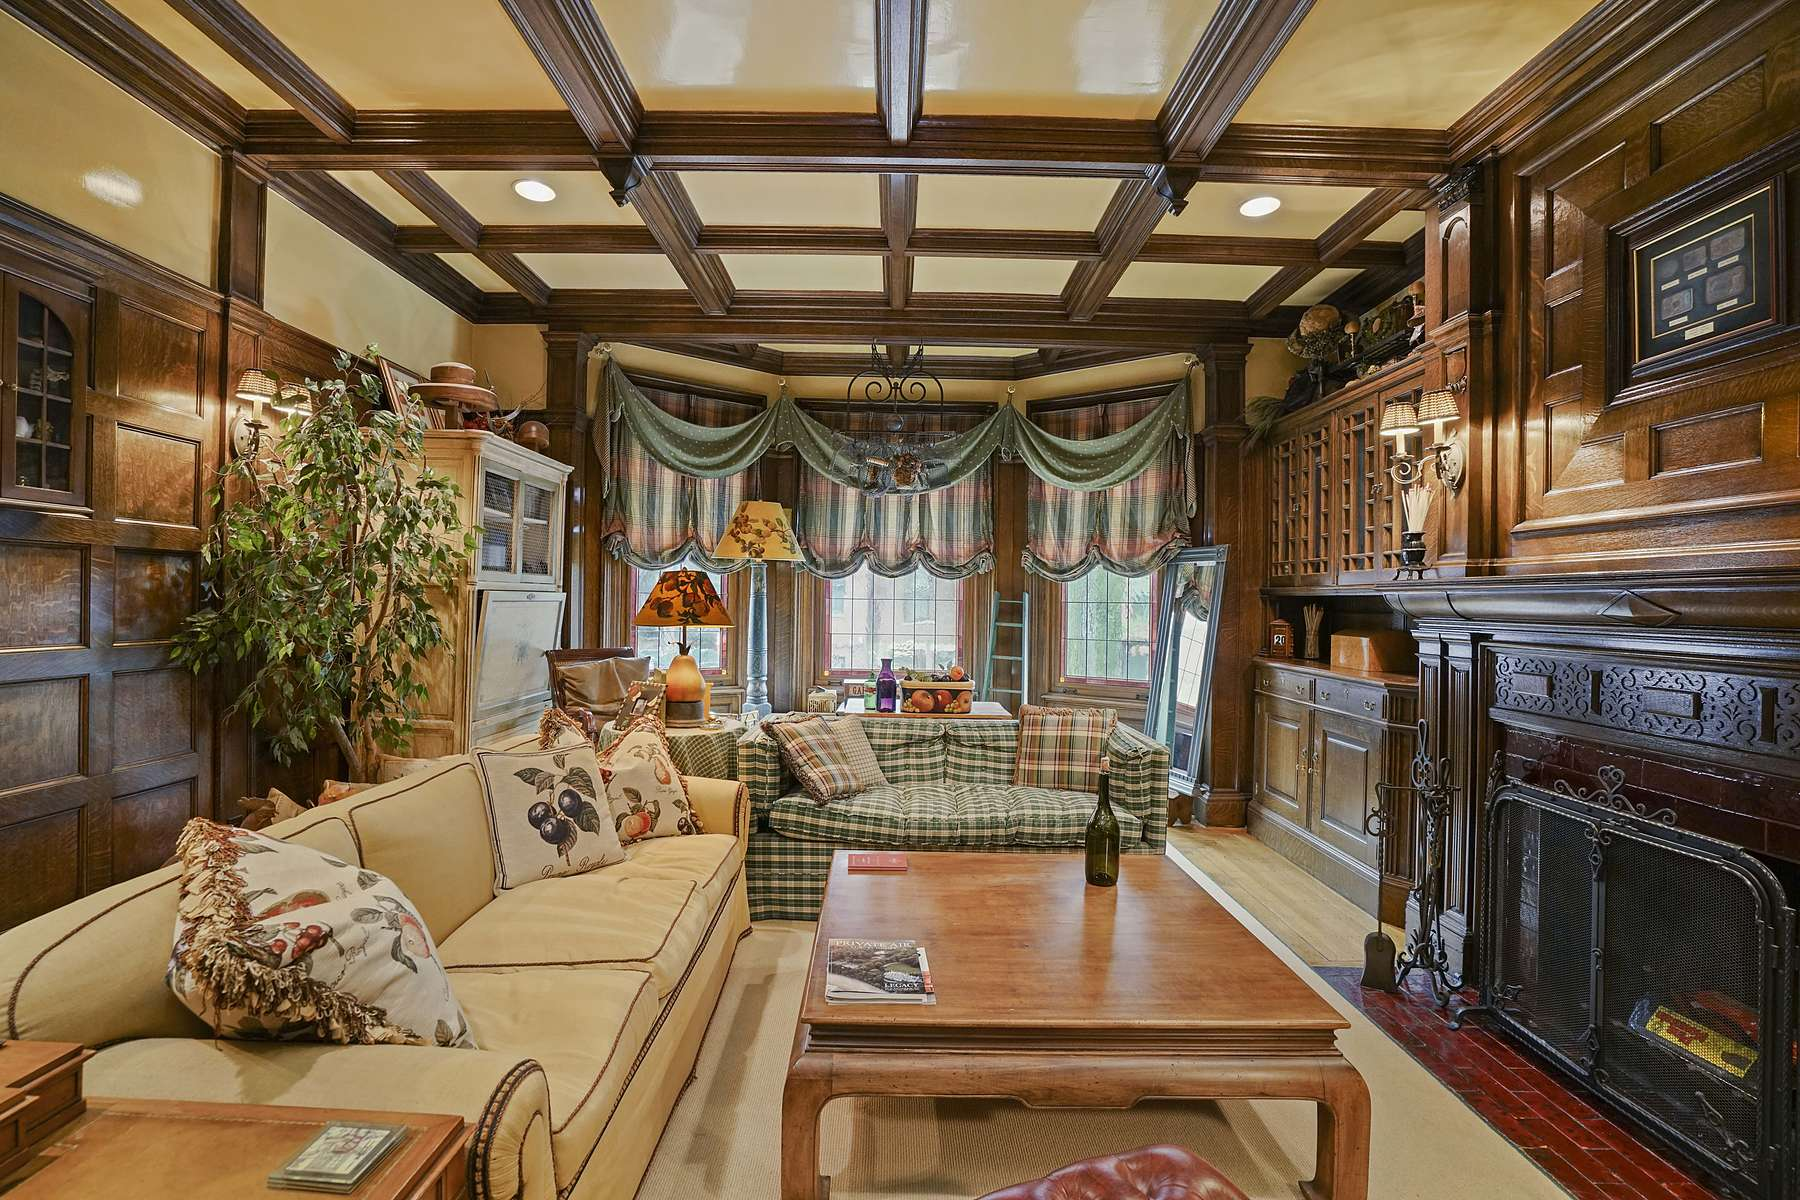 Condominiums για την Πώληση στο The Finest Craftsmanship in Back Bay 359 Beacon Street Unit 2,4, Βοστώνη, Μασαχουσετη 02116 Ηνωμένες Πολιτείες